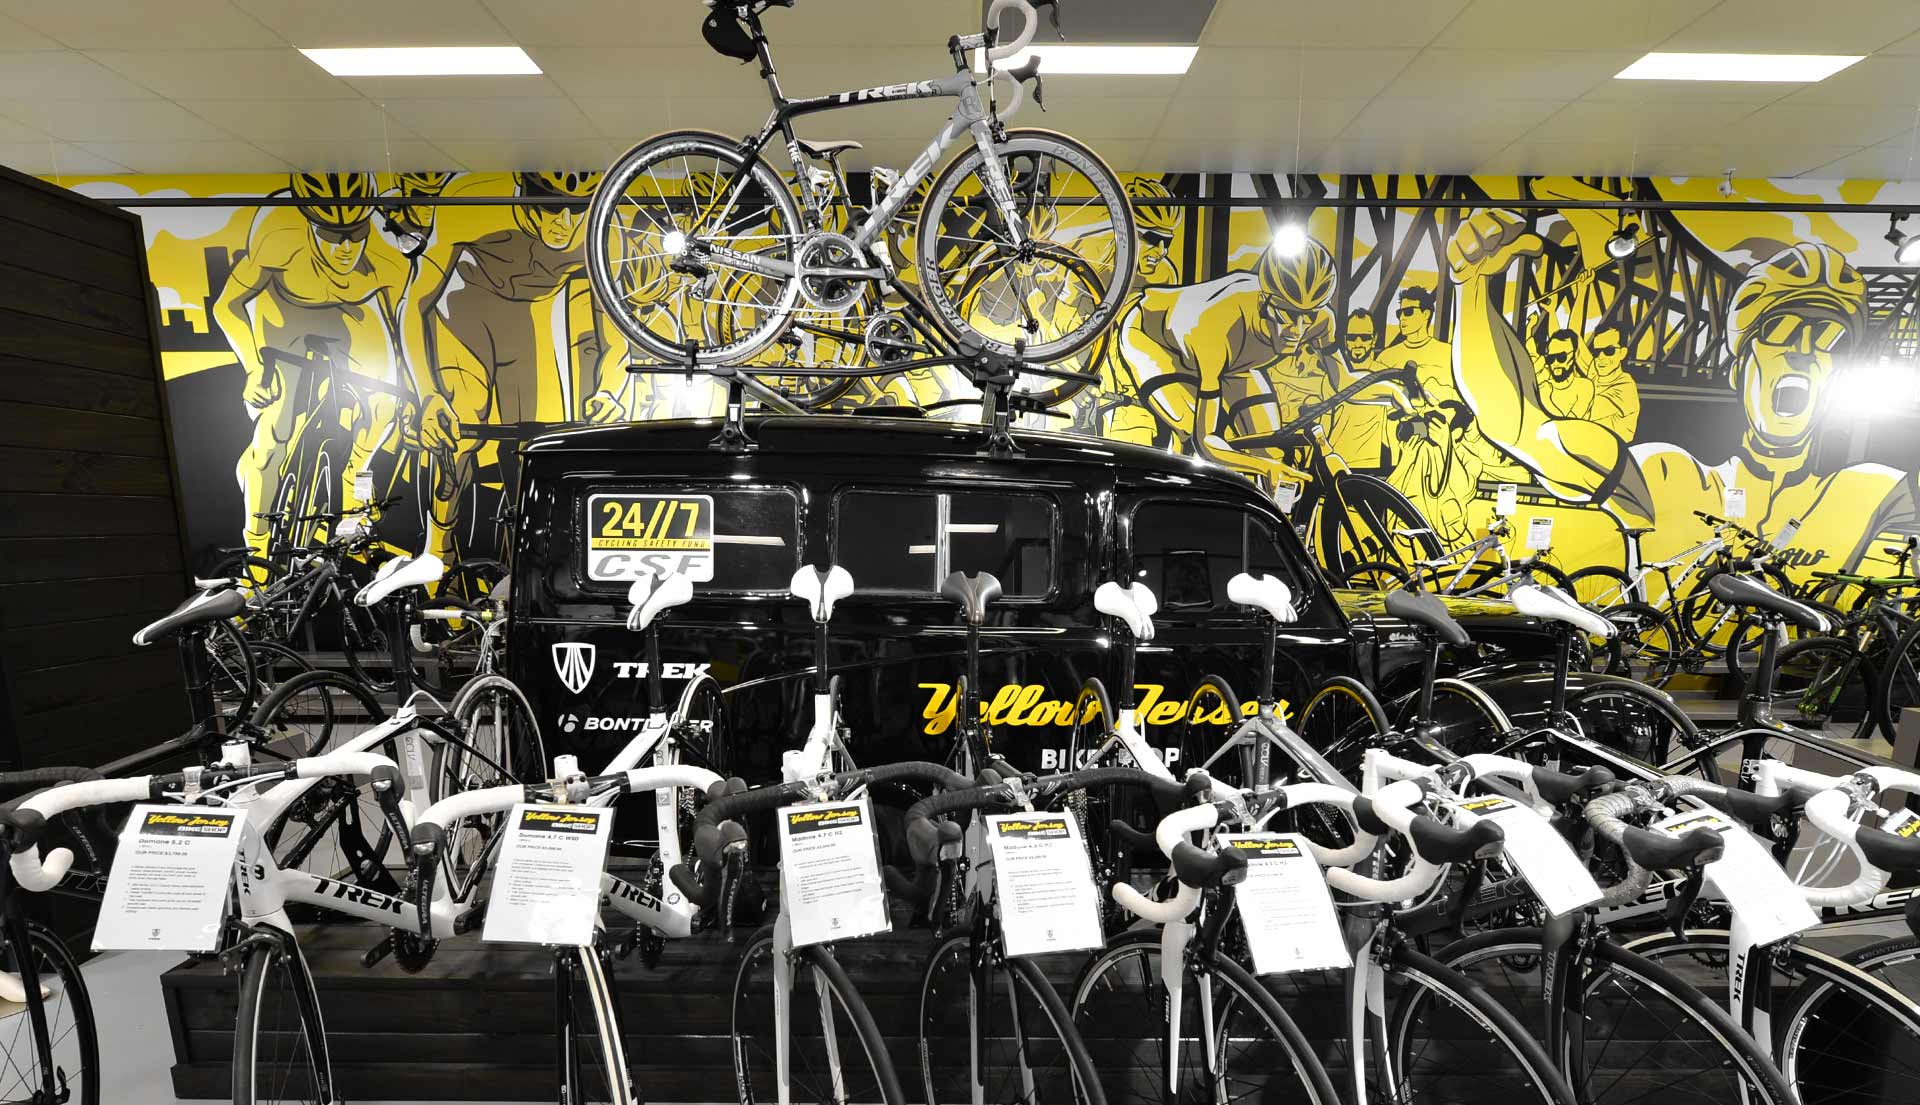 IKL-WEB_2014_1920-Content-Yellow-Jersey_10